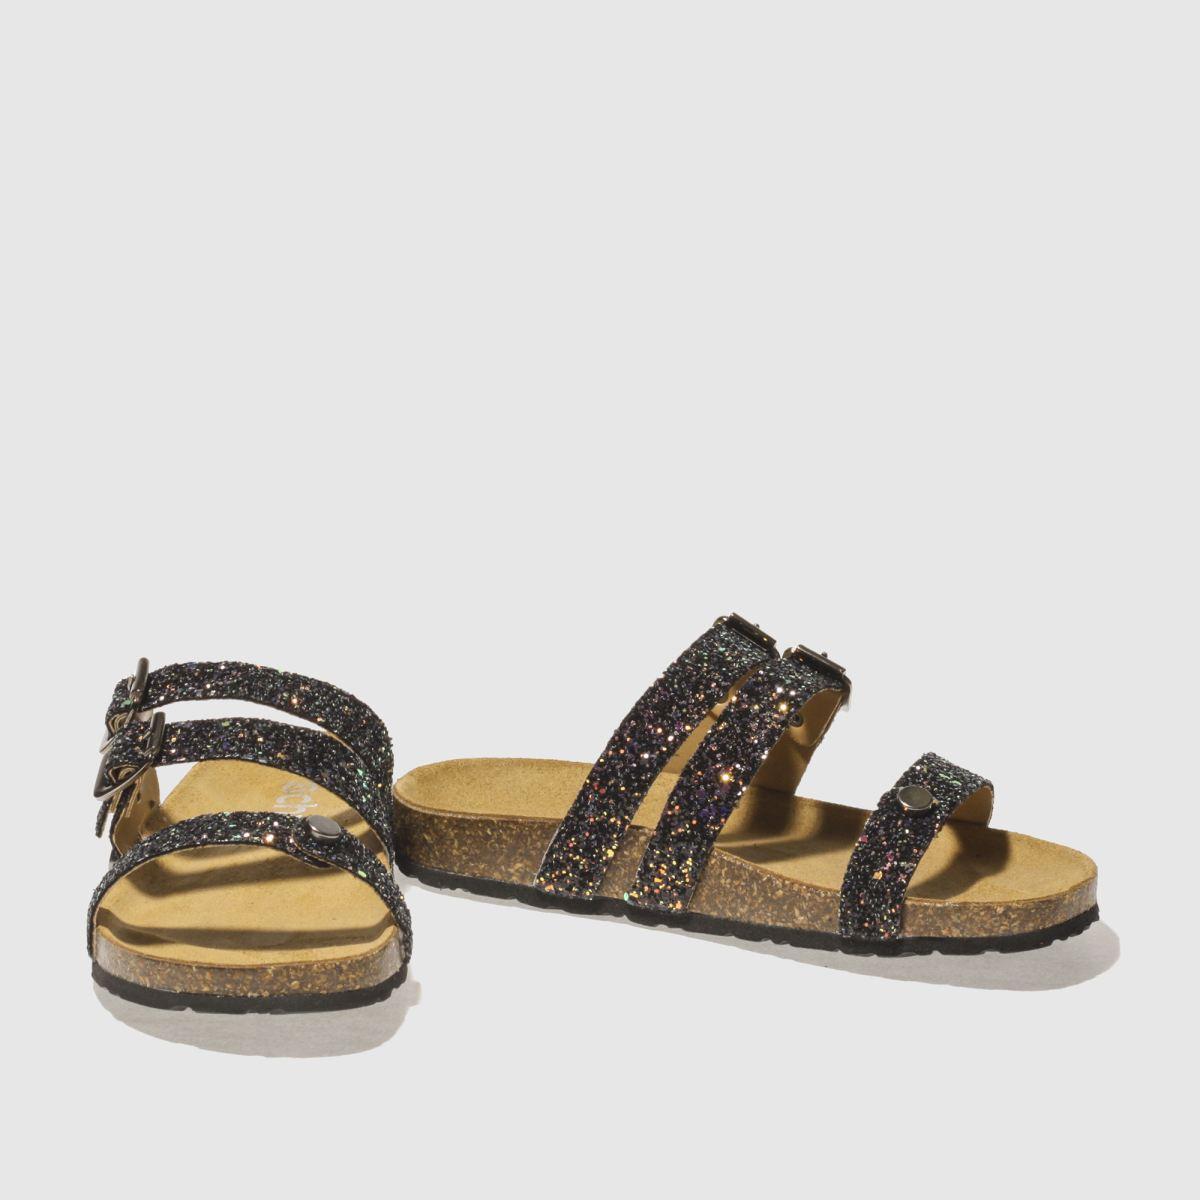 Damen Schwarz schuh Berlin Sandalen | schuh Gute Qualität beliebte Schuhe